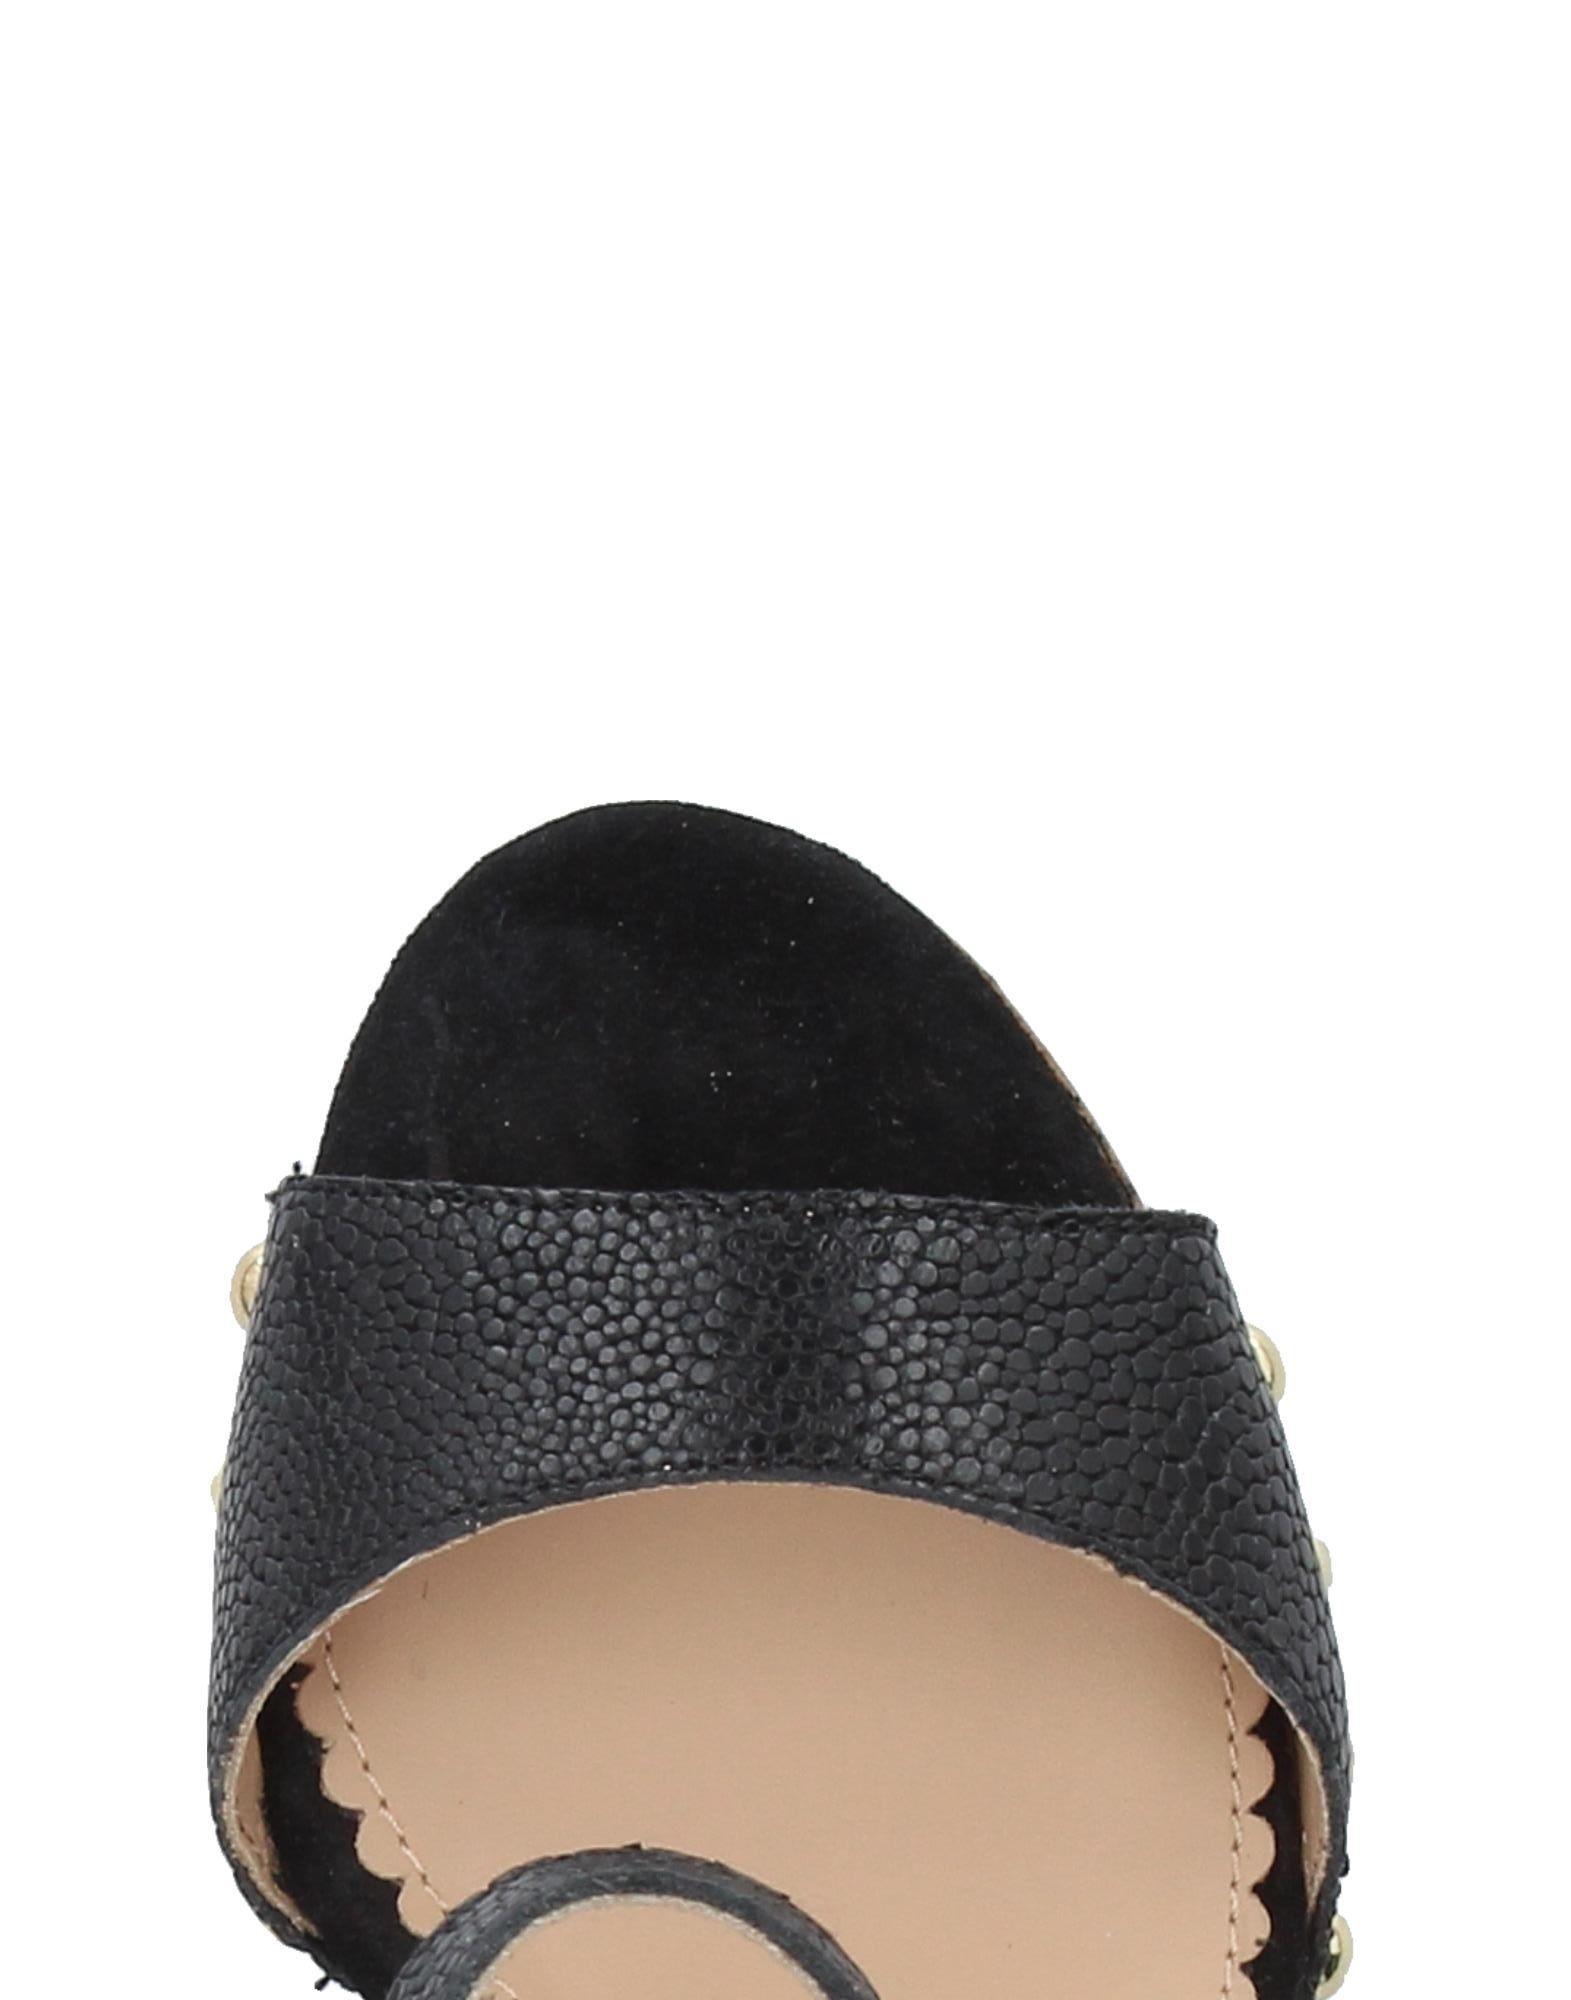 11391282RX Ash Sandalen Damen  11391282RX  Heiße Schuhe 5d9099